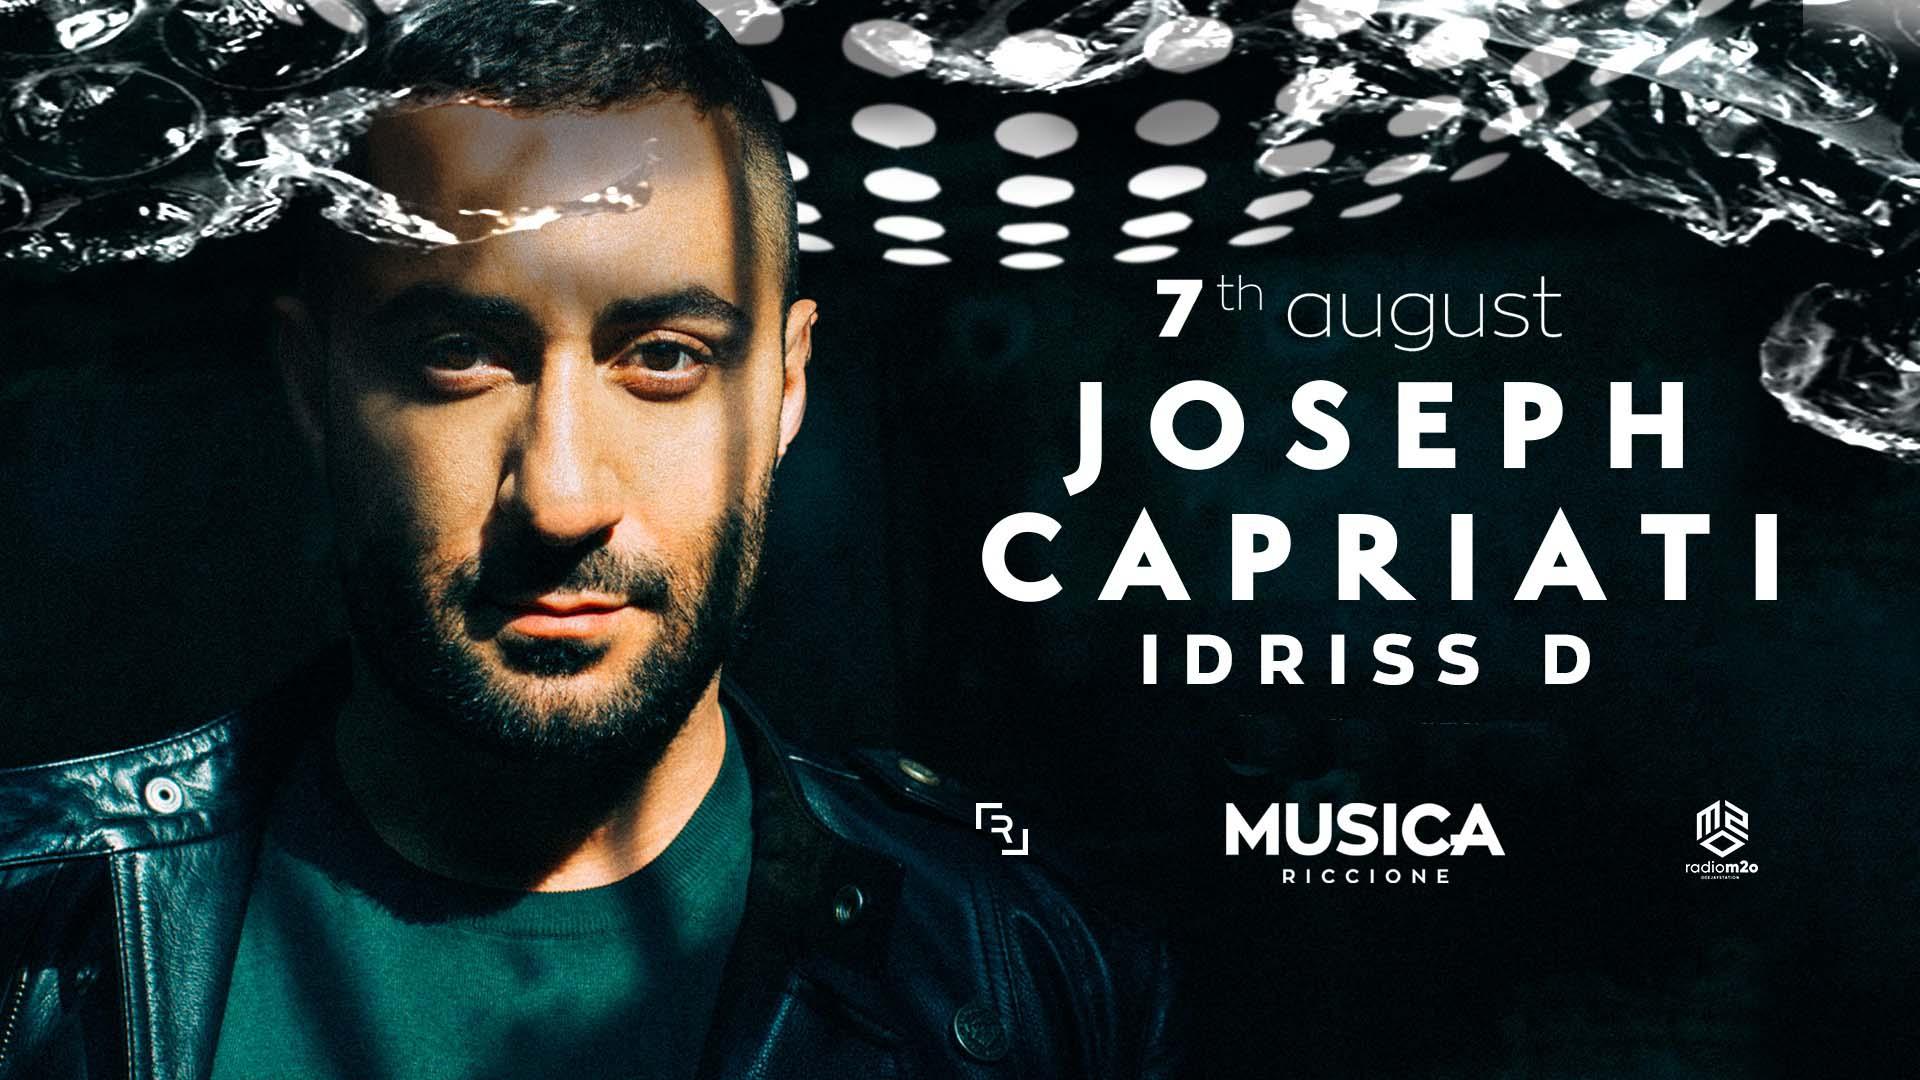 joseph capriati 7 agosto 2021 musica